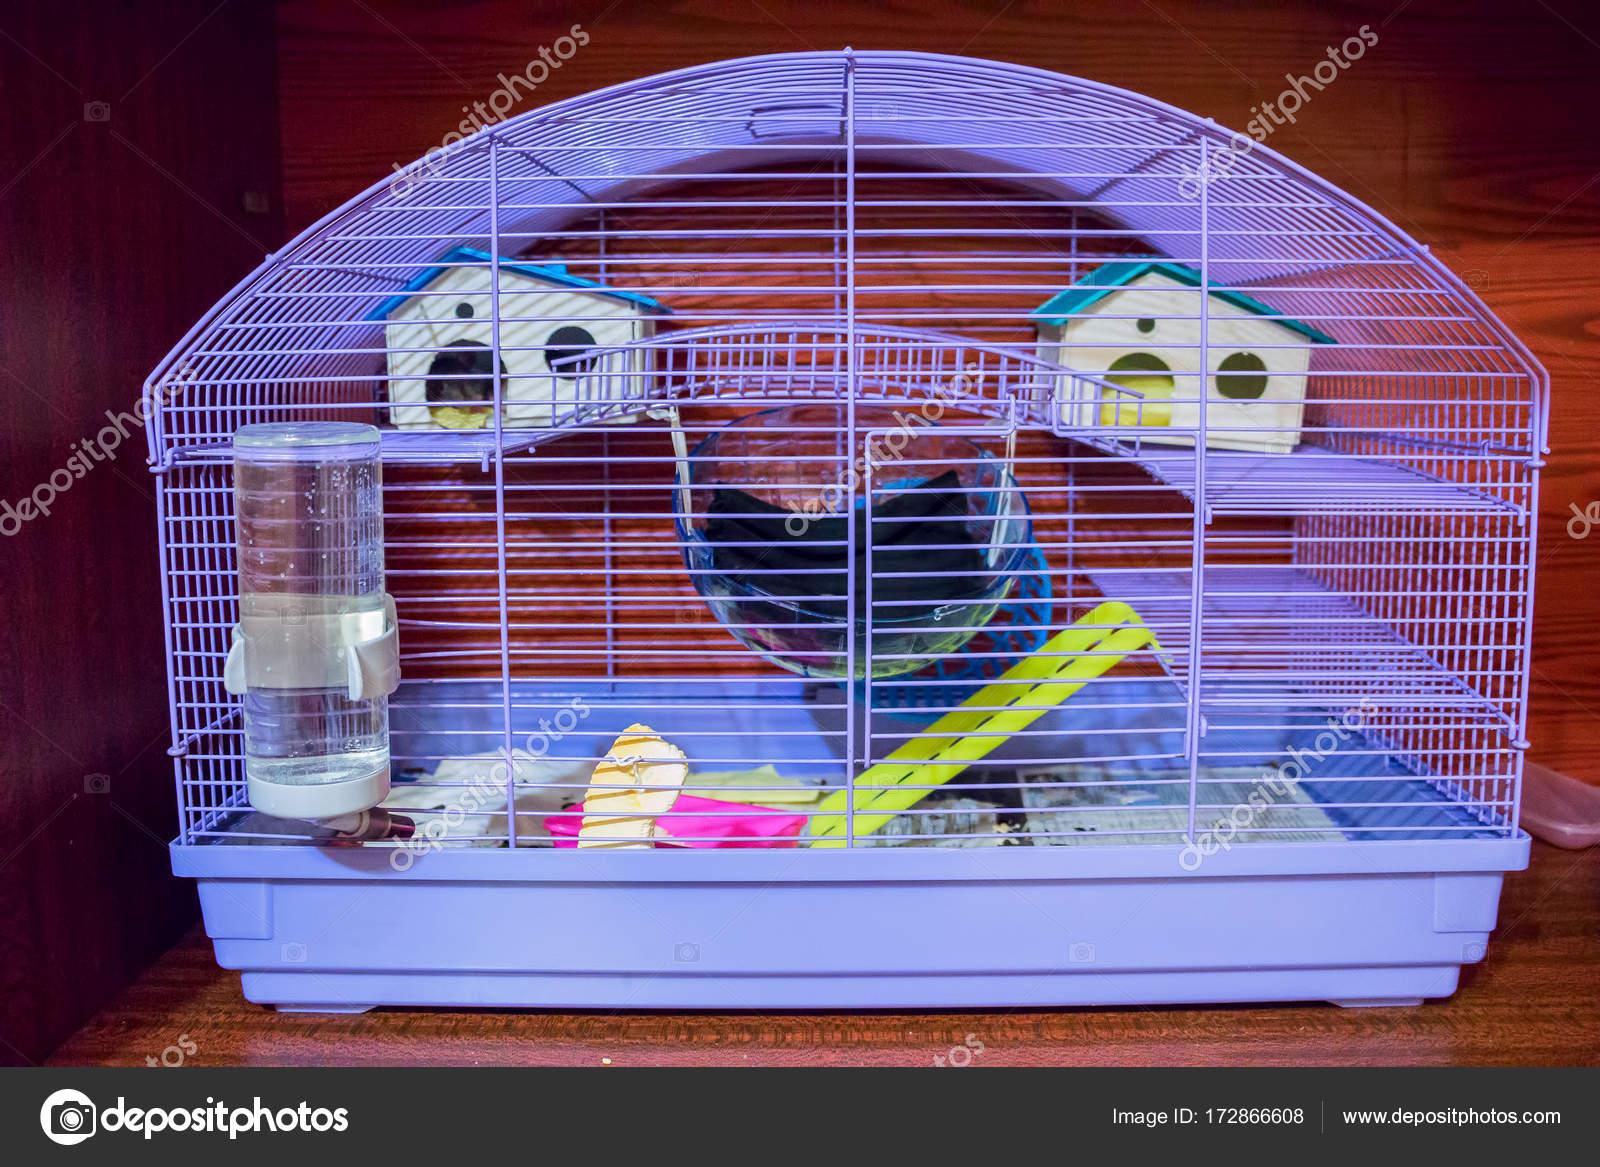 Käfig für Kleintiere — Stockfoto © pro2audio.gmail.com #172866608